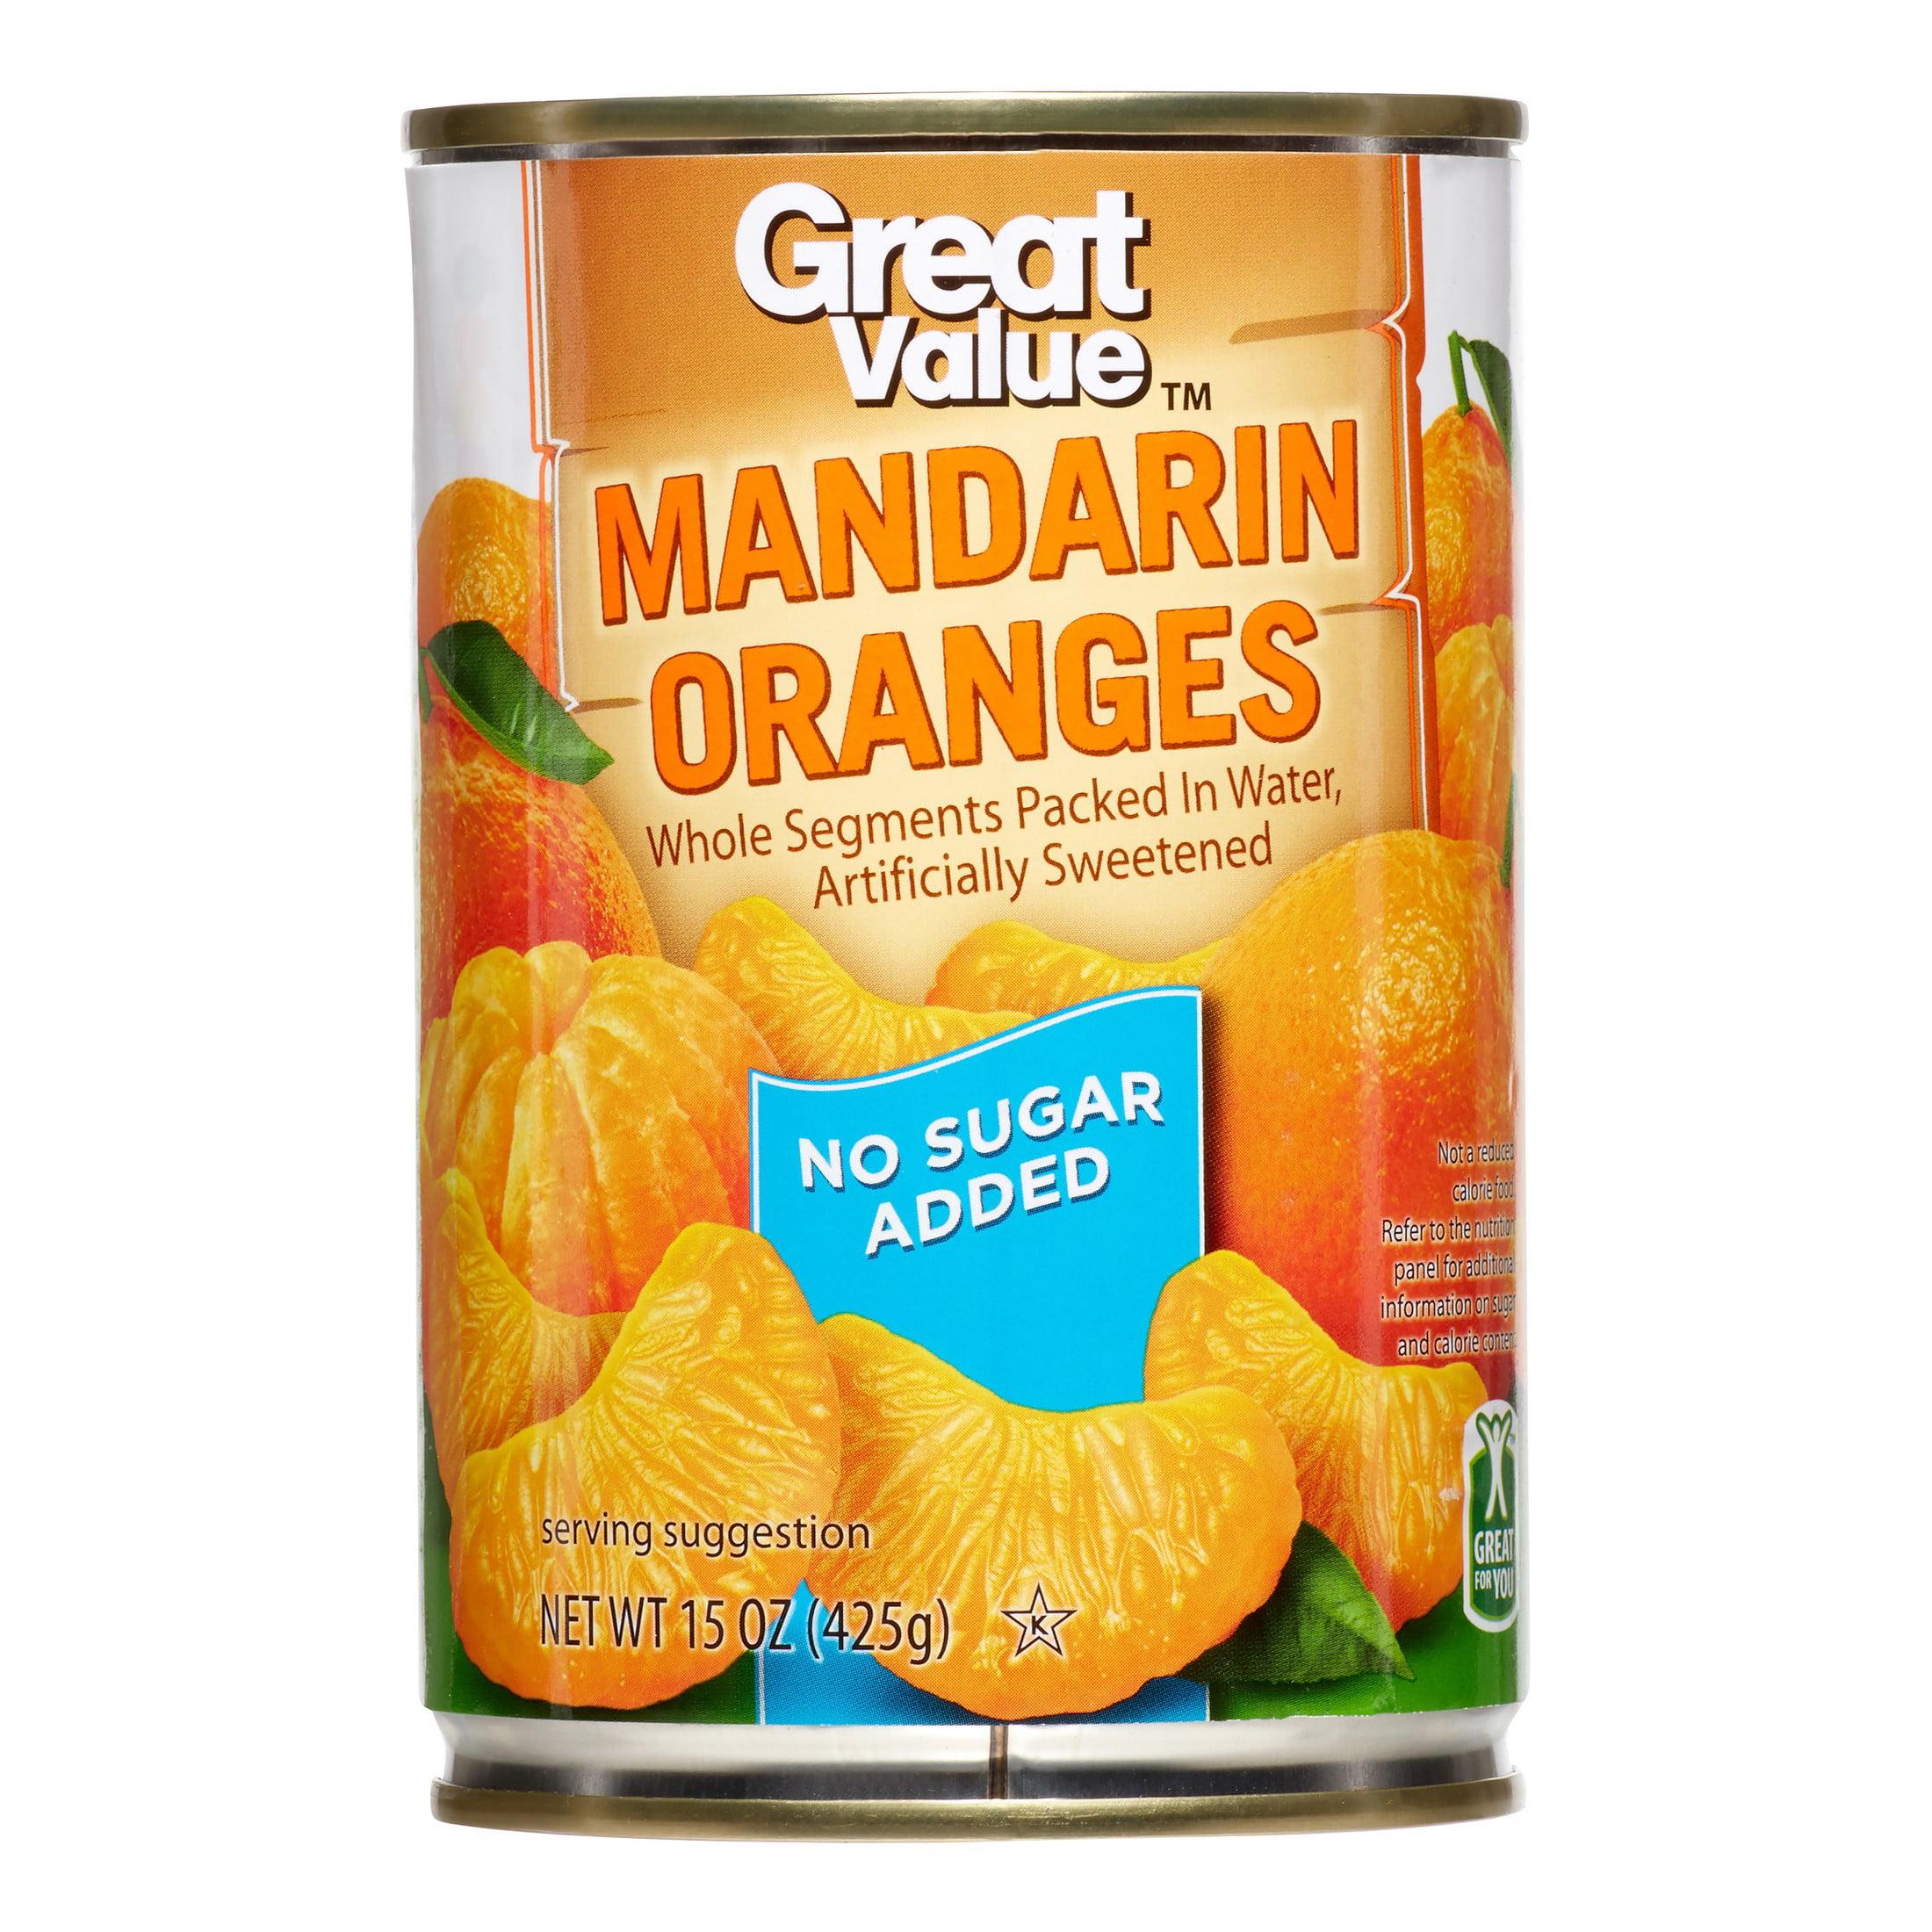 Great Value No Sugar Added Mandarin Oranges, 15 oz